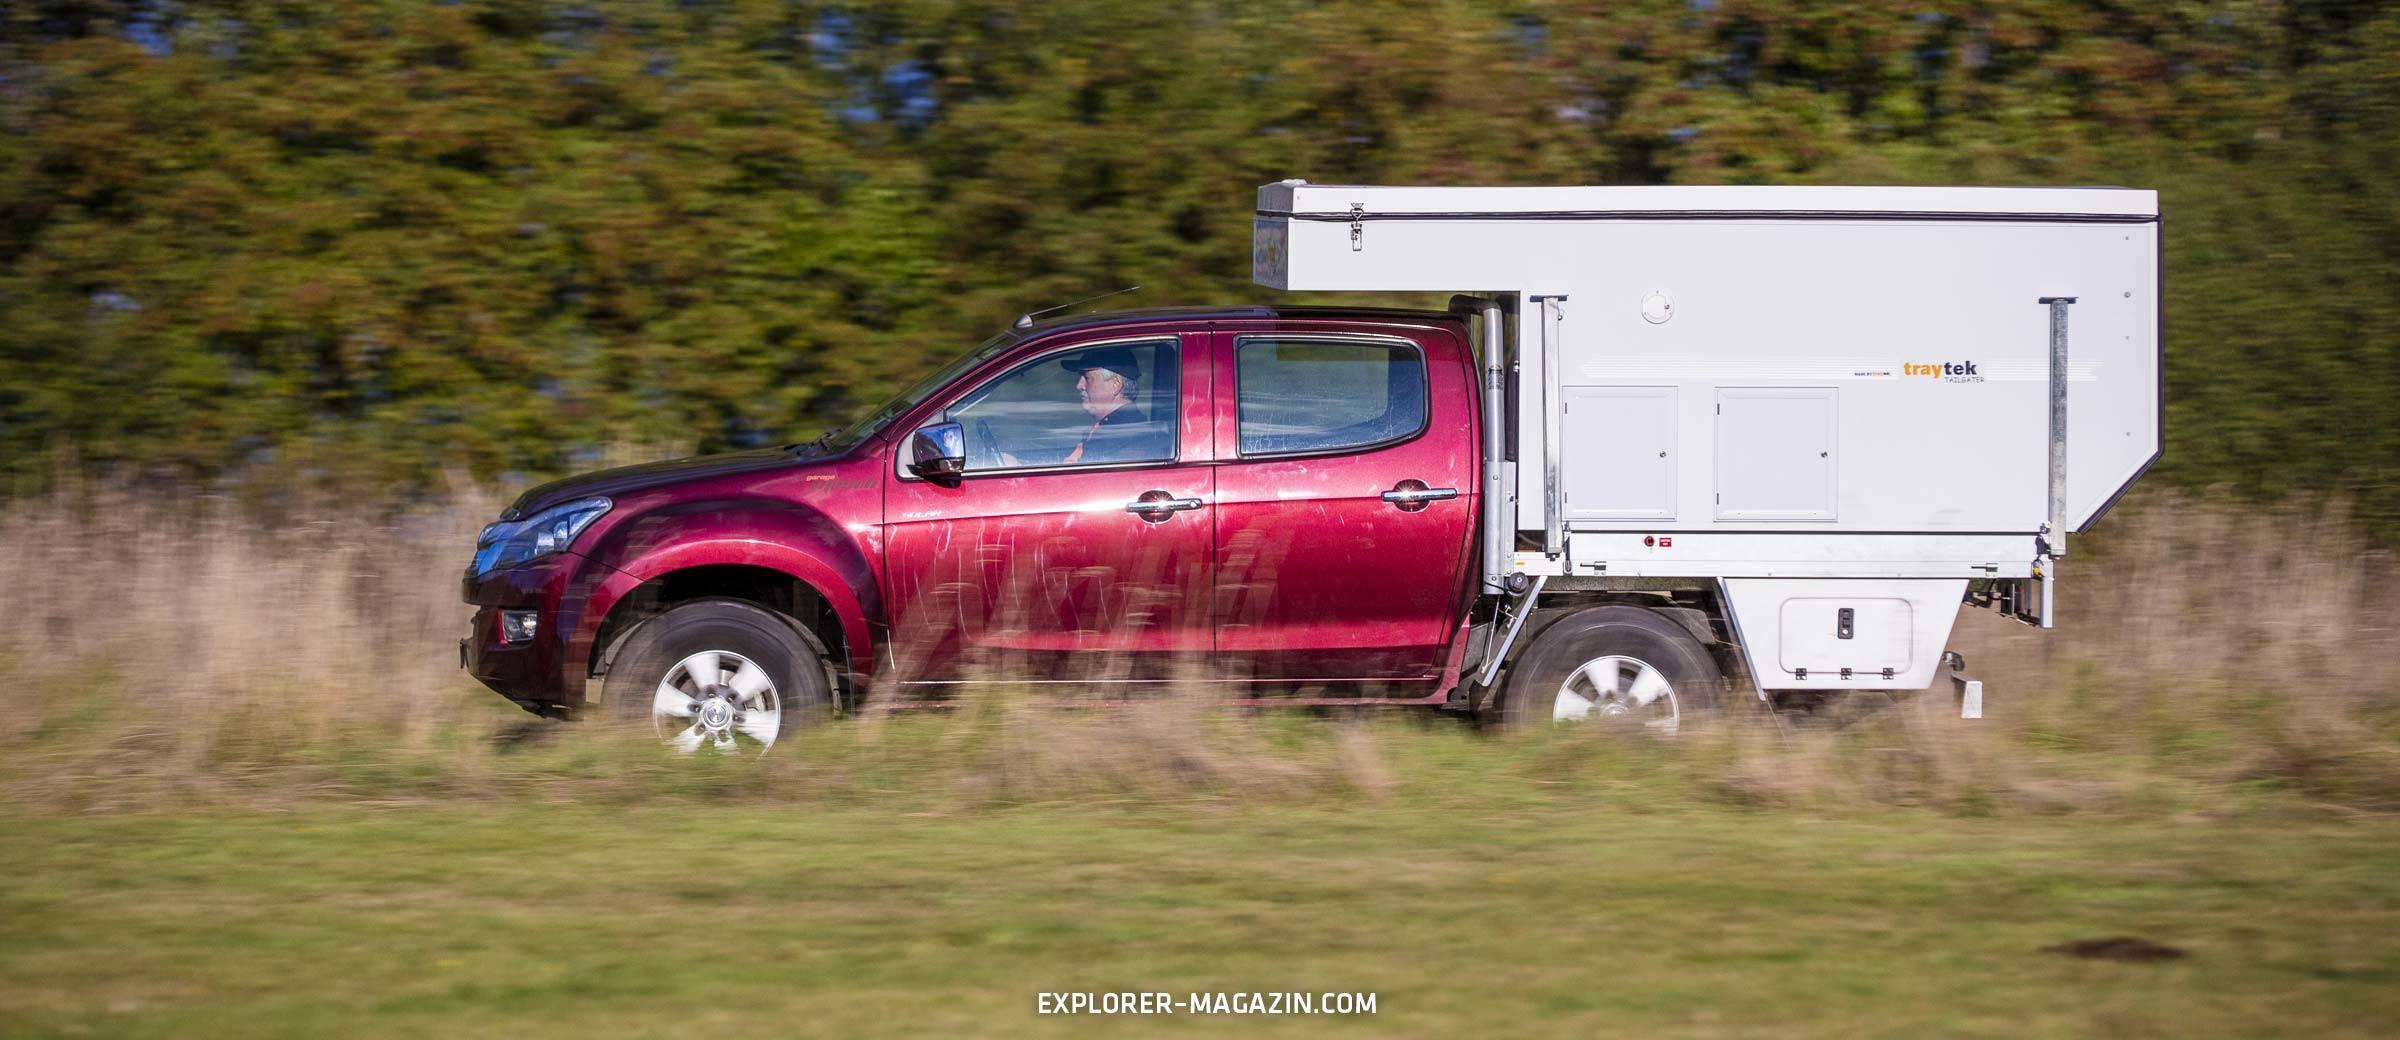 Pickup Aufstelldachkabine - Trayon Traytek Tailgater